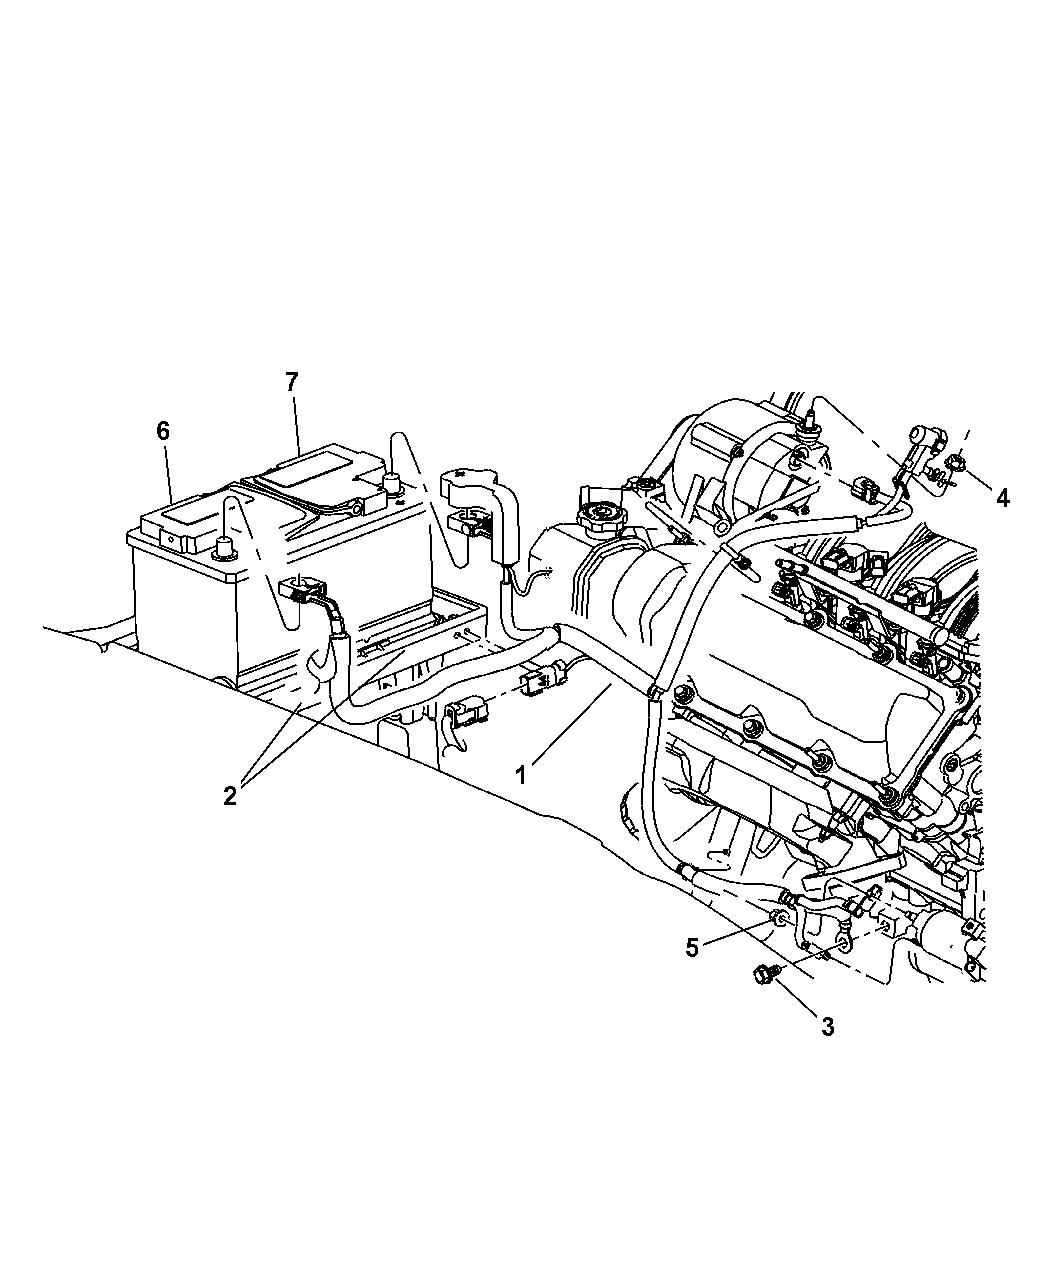 2007 jeep commander battery tray wiring mopar parts giant rh moparpartsgiant com